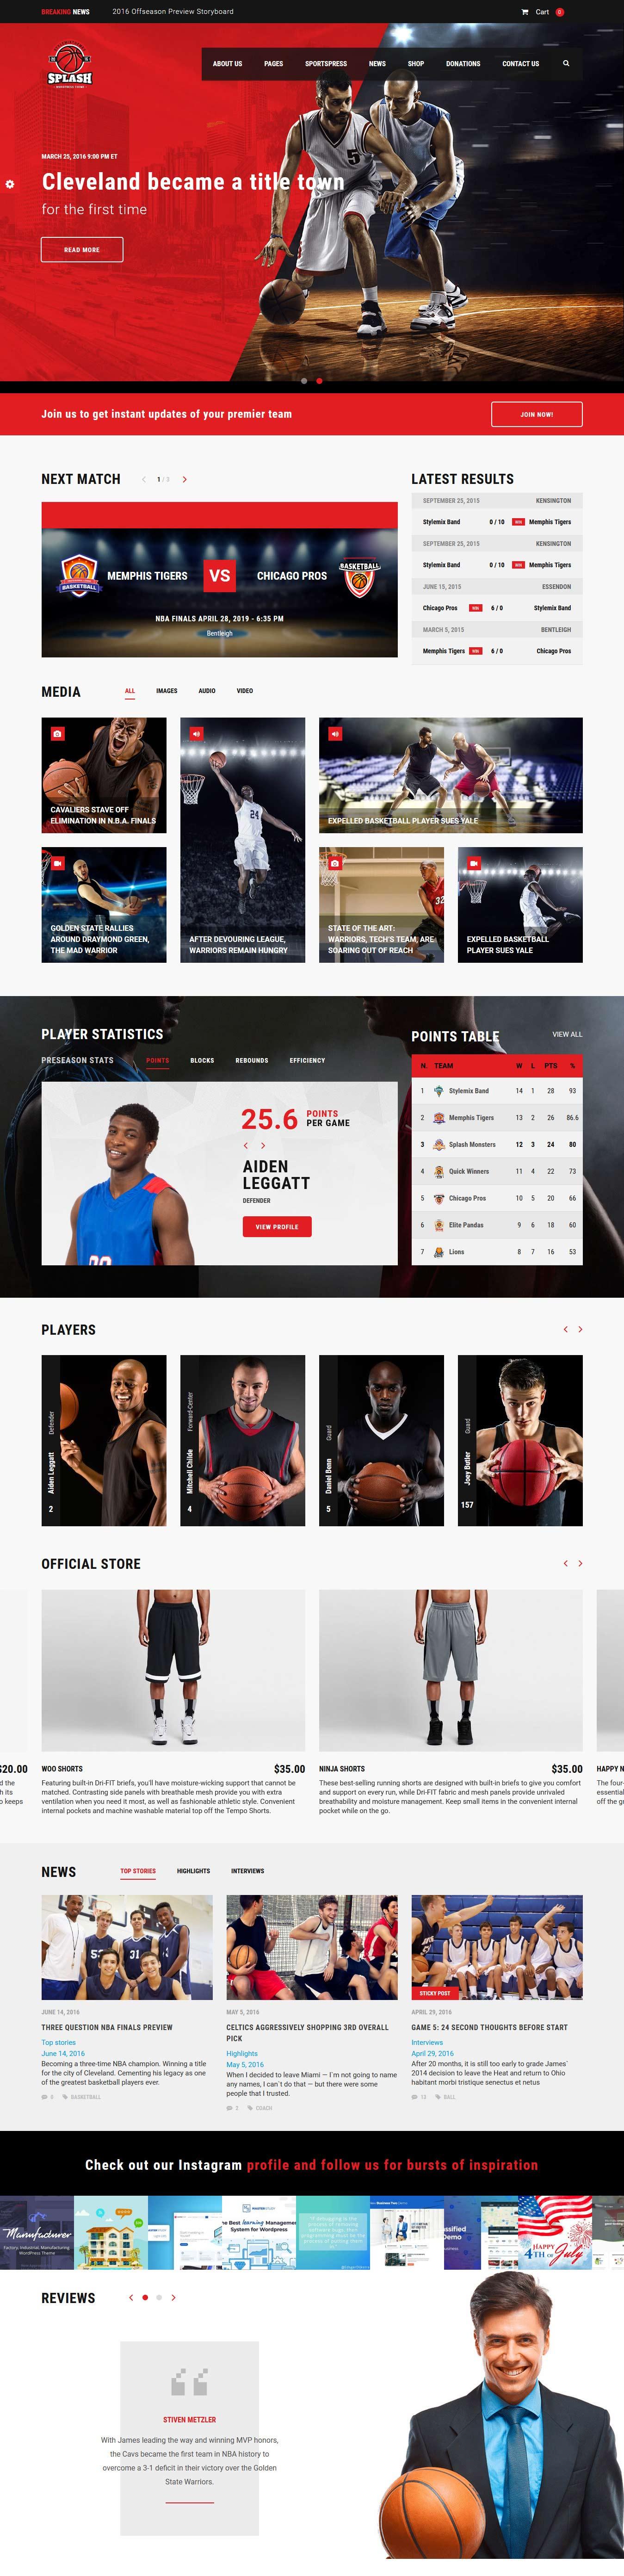 Splash -Best Premium Sports WordPress Theme